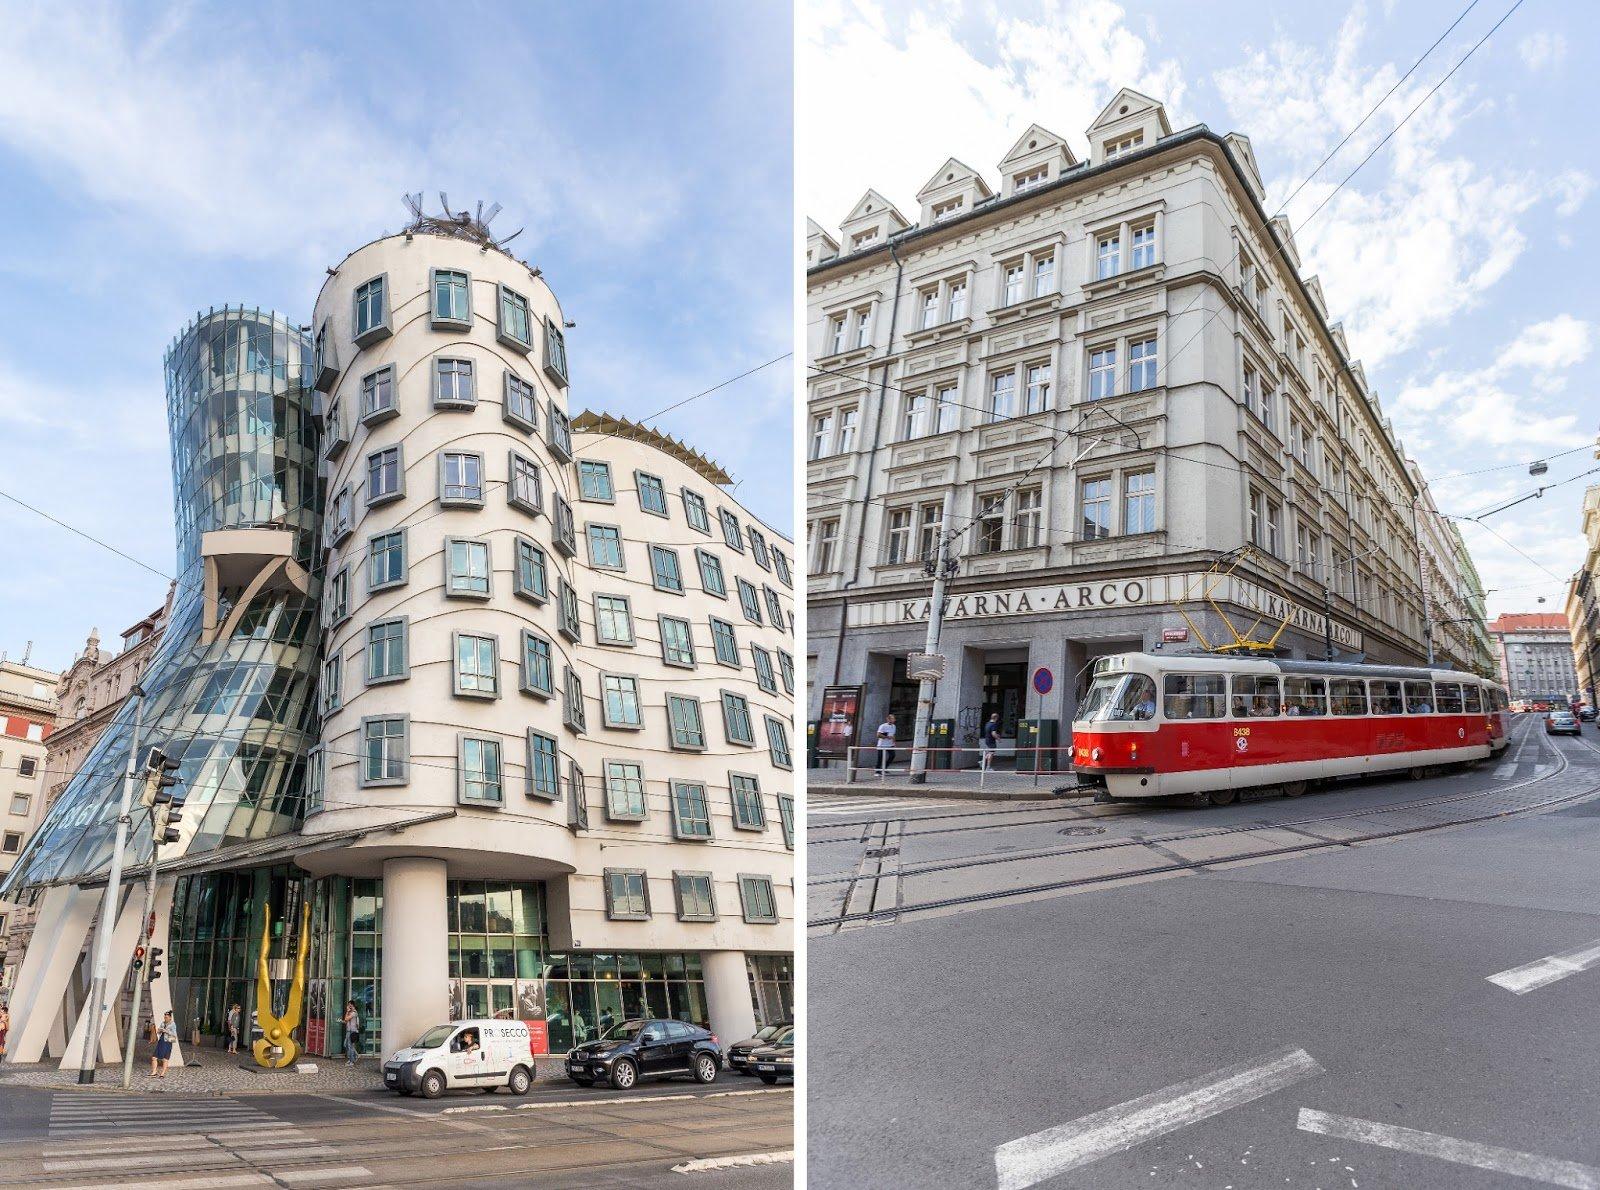 Prague maison dansante et tram